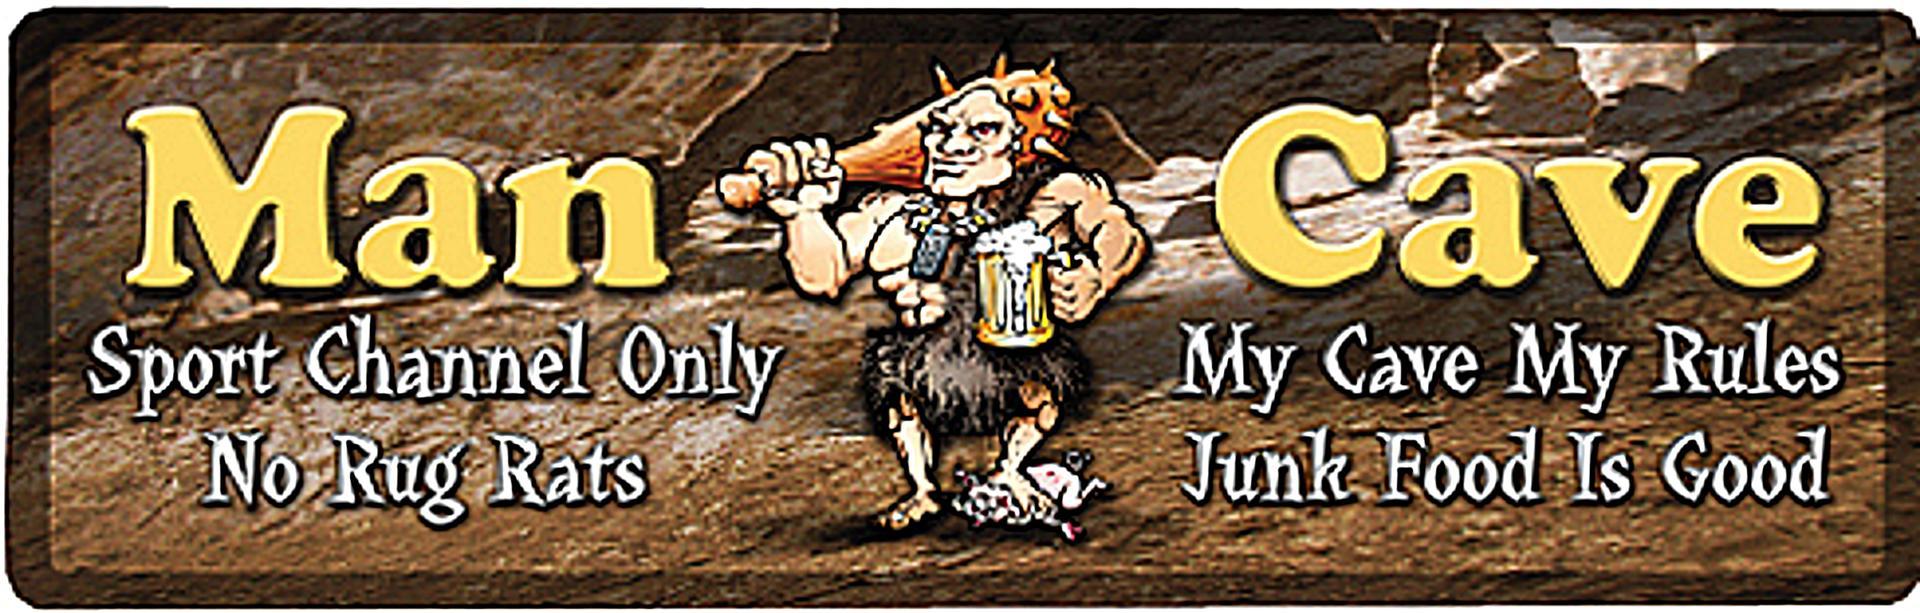 Man Cave Gifts Australia : Bar runner man cave rules bartop mat beer fun novelty gift